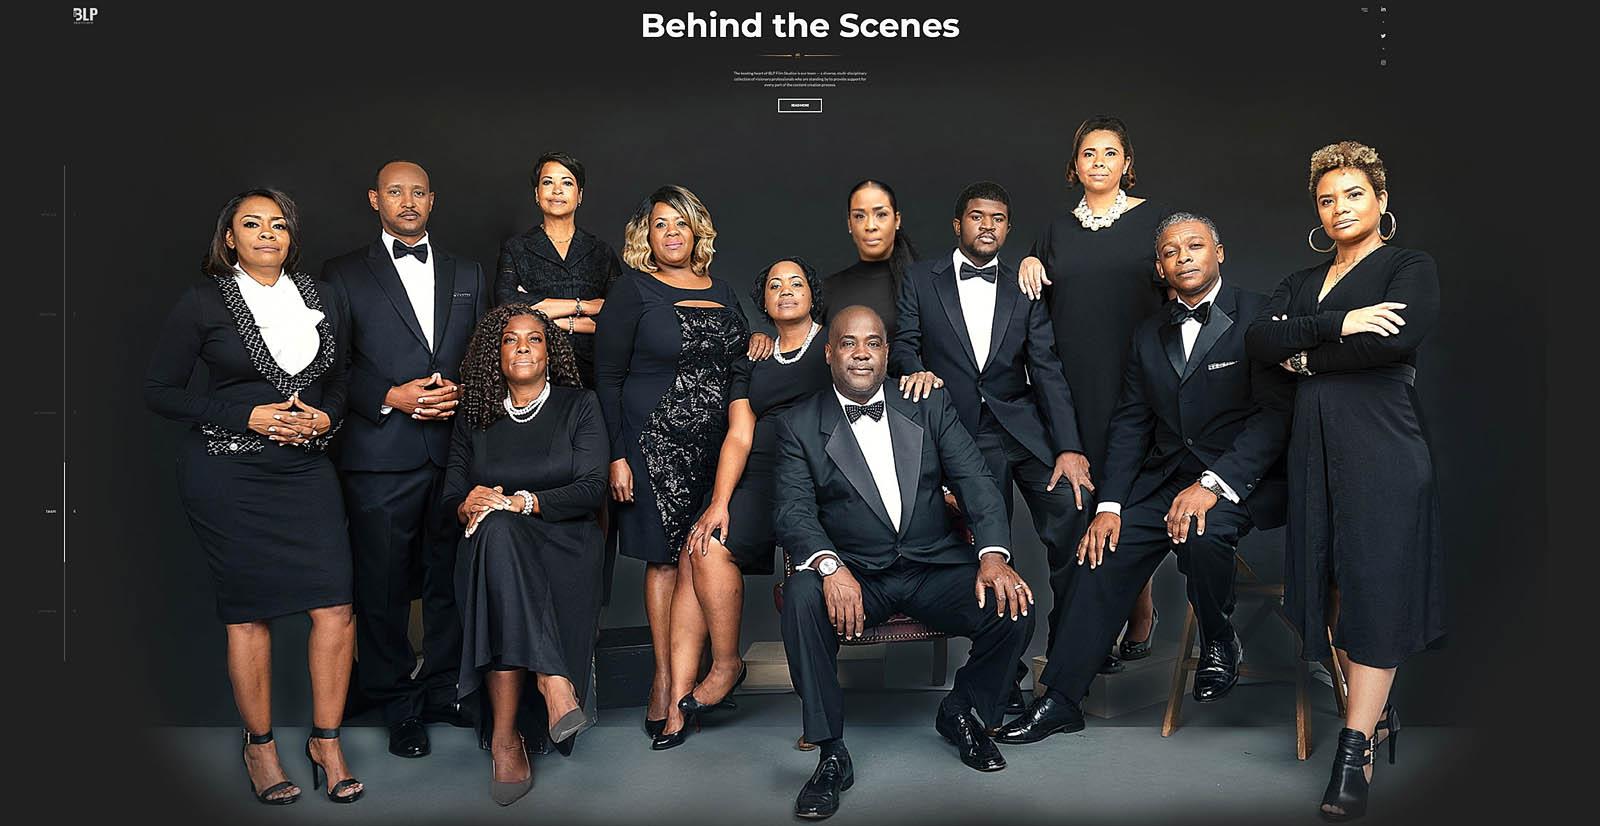 Black tie corporate group portraits